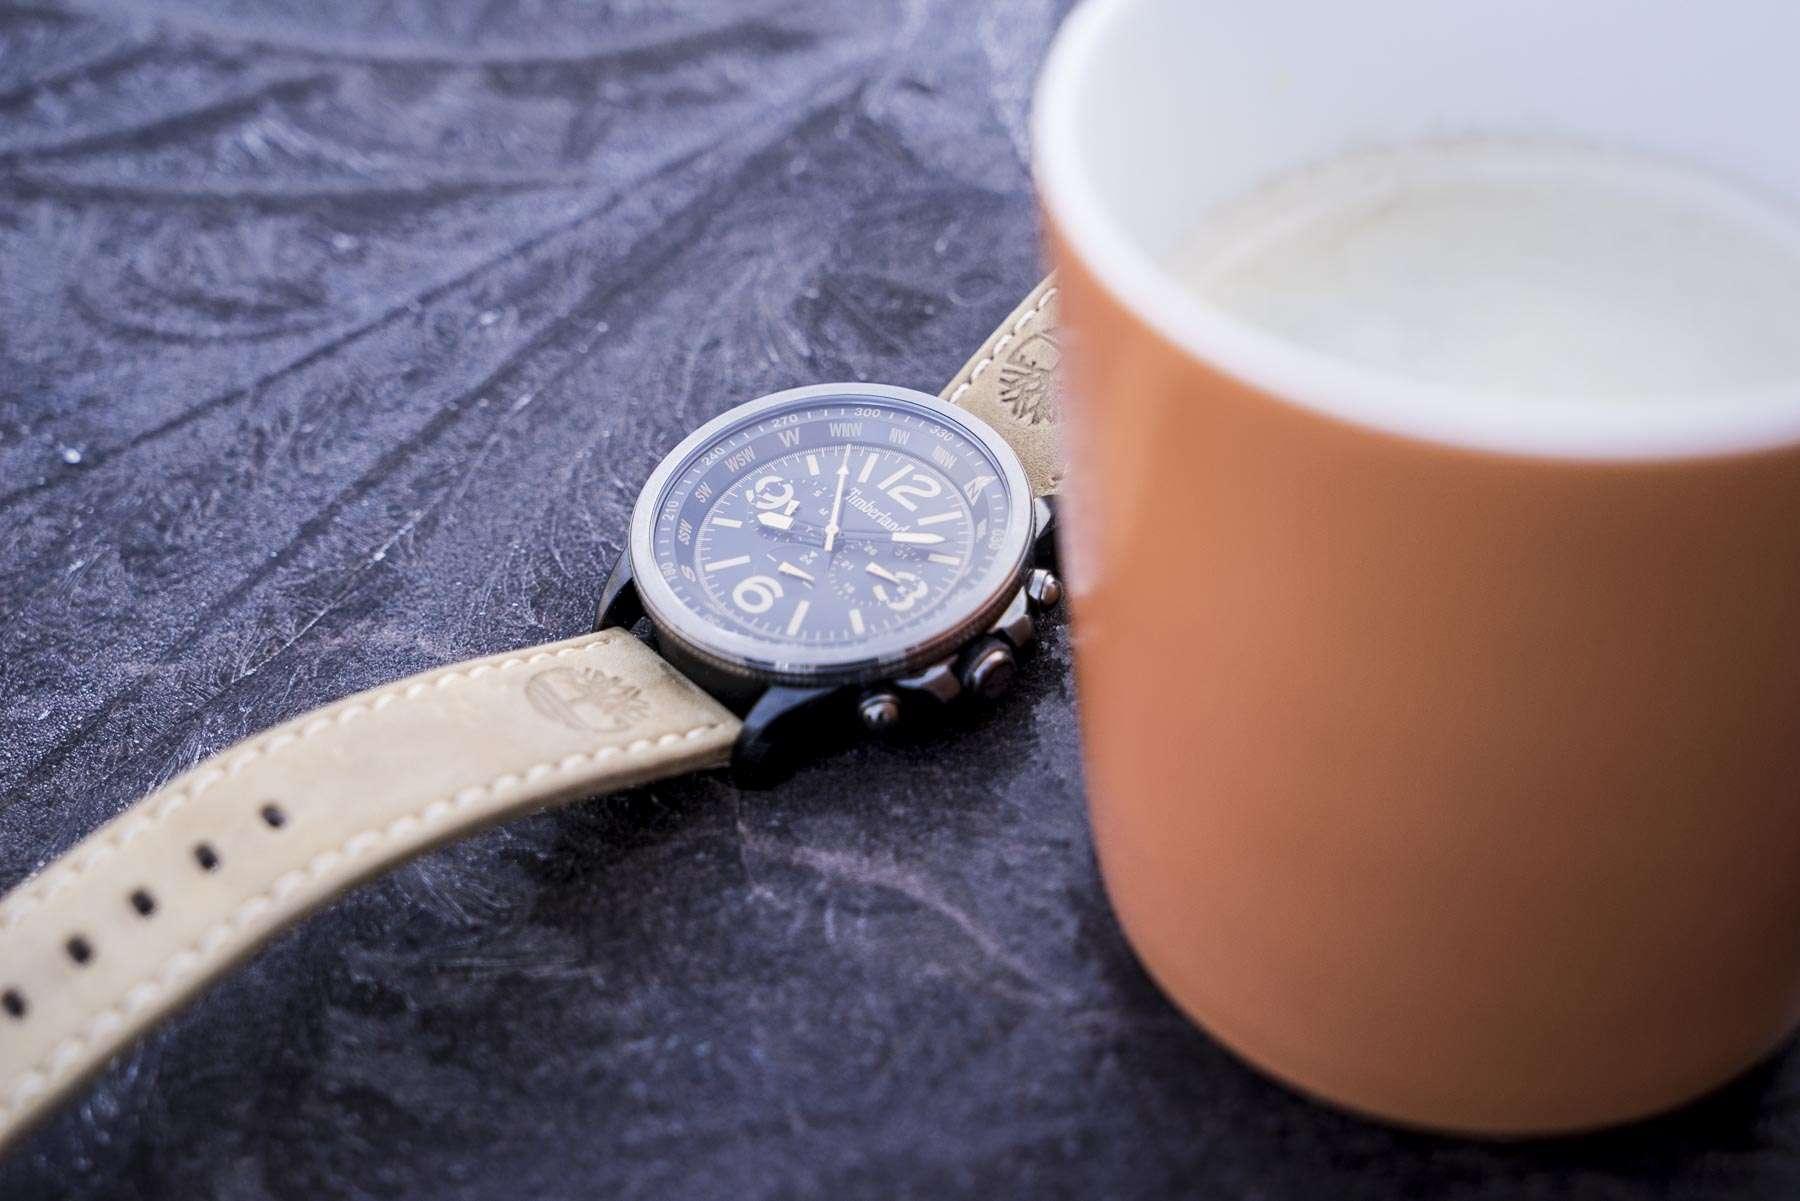 Uhrenfotografie, watchphotography, Uhrenfoto, Uhrenfotograf, watchphoto, watchphotographer, Uhrenvideo, watchvideo